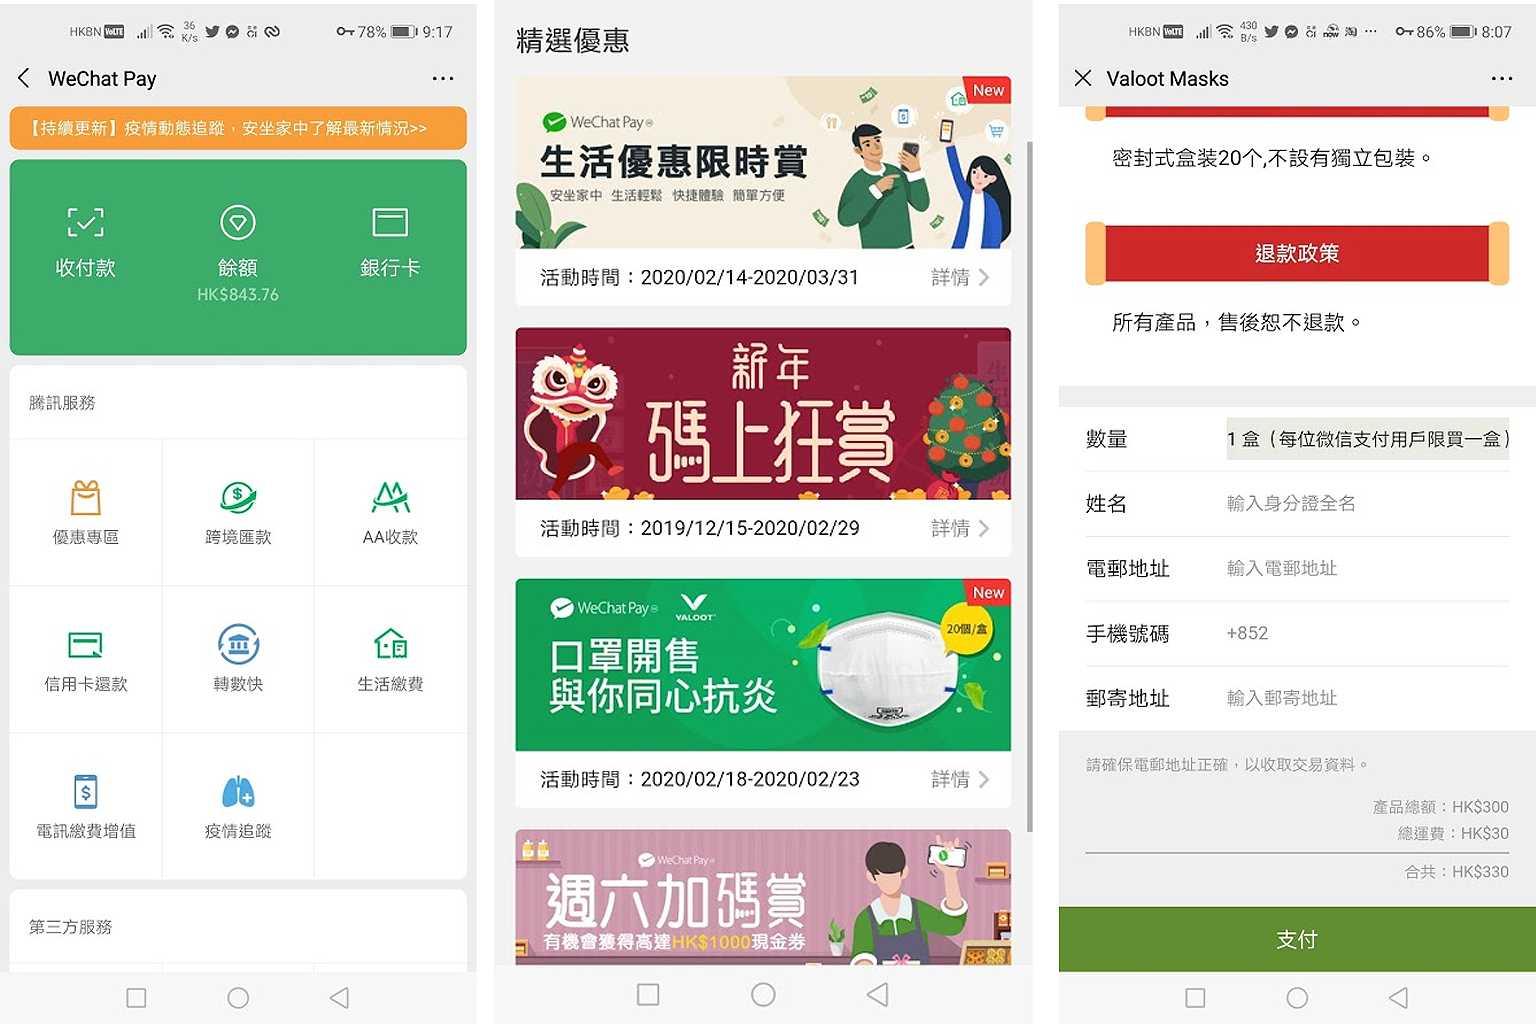 WeChat Pay HK x Valoot:口罩開售 – GetJetso 香港著數優惠網